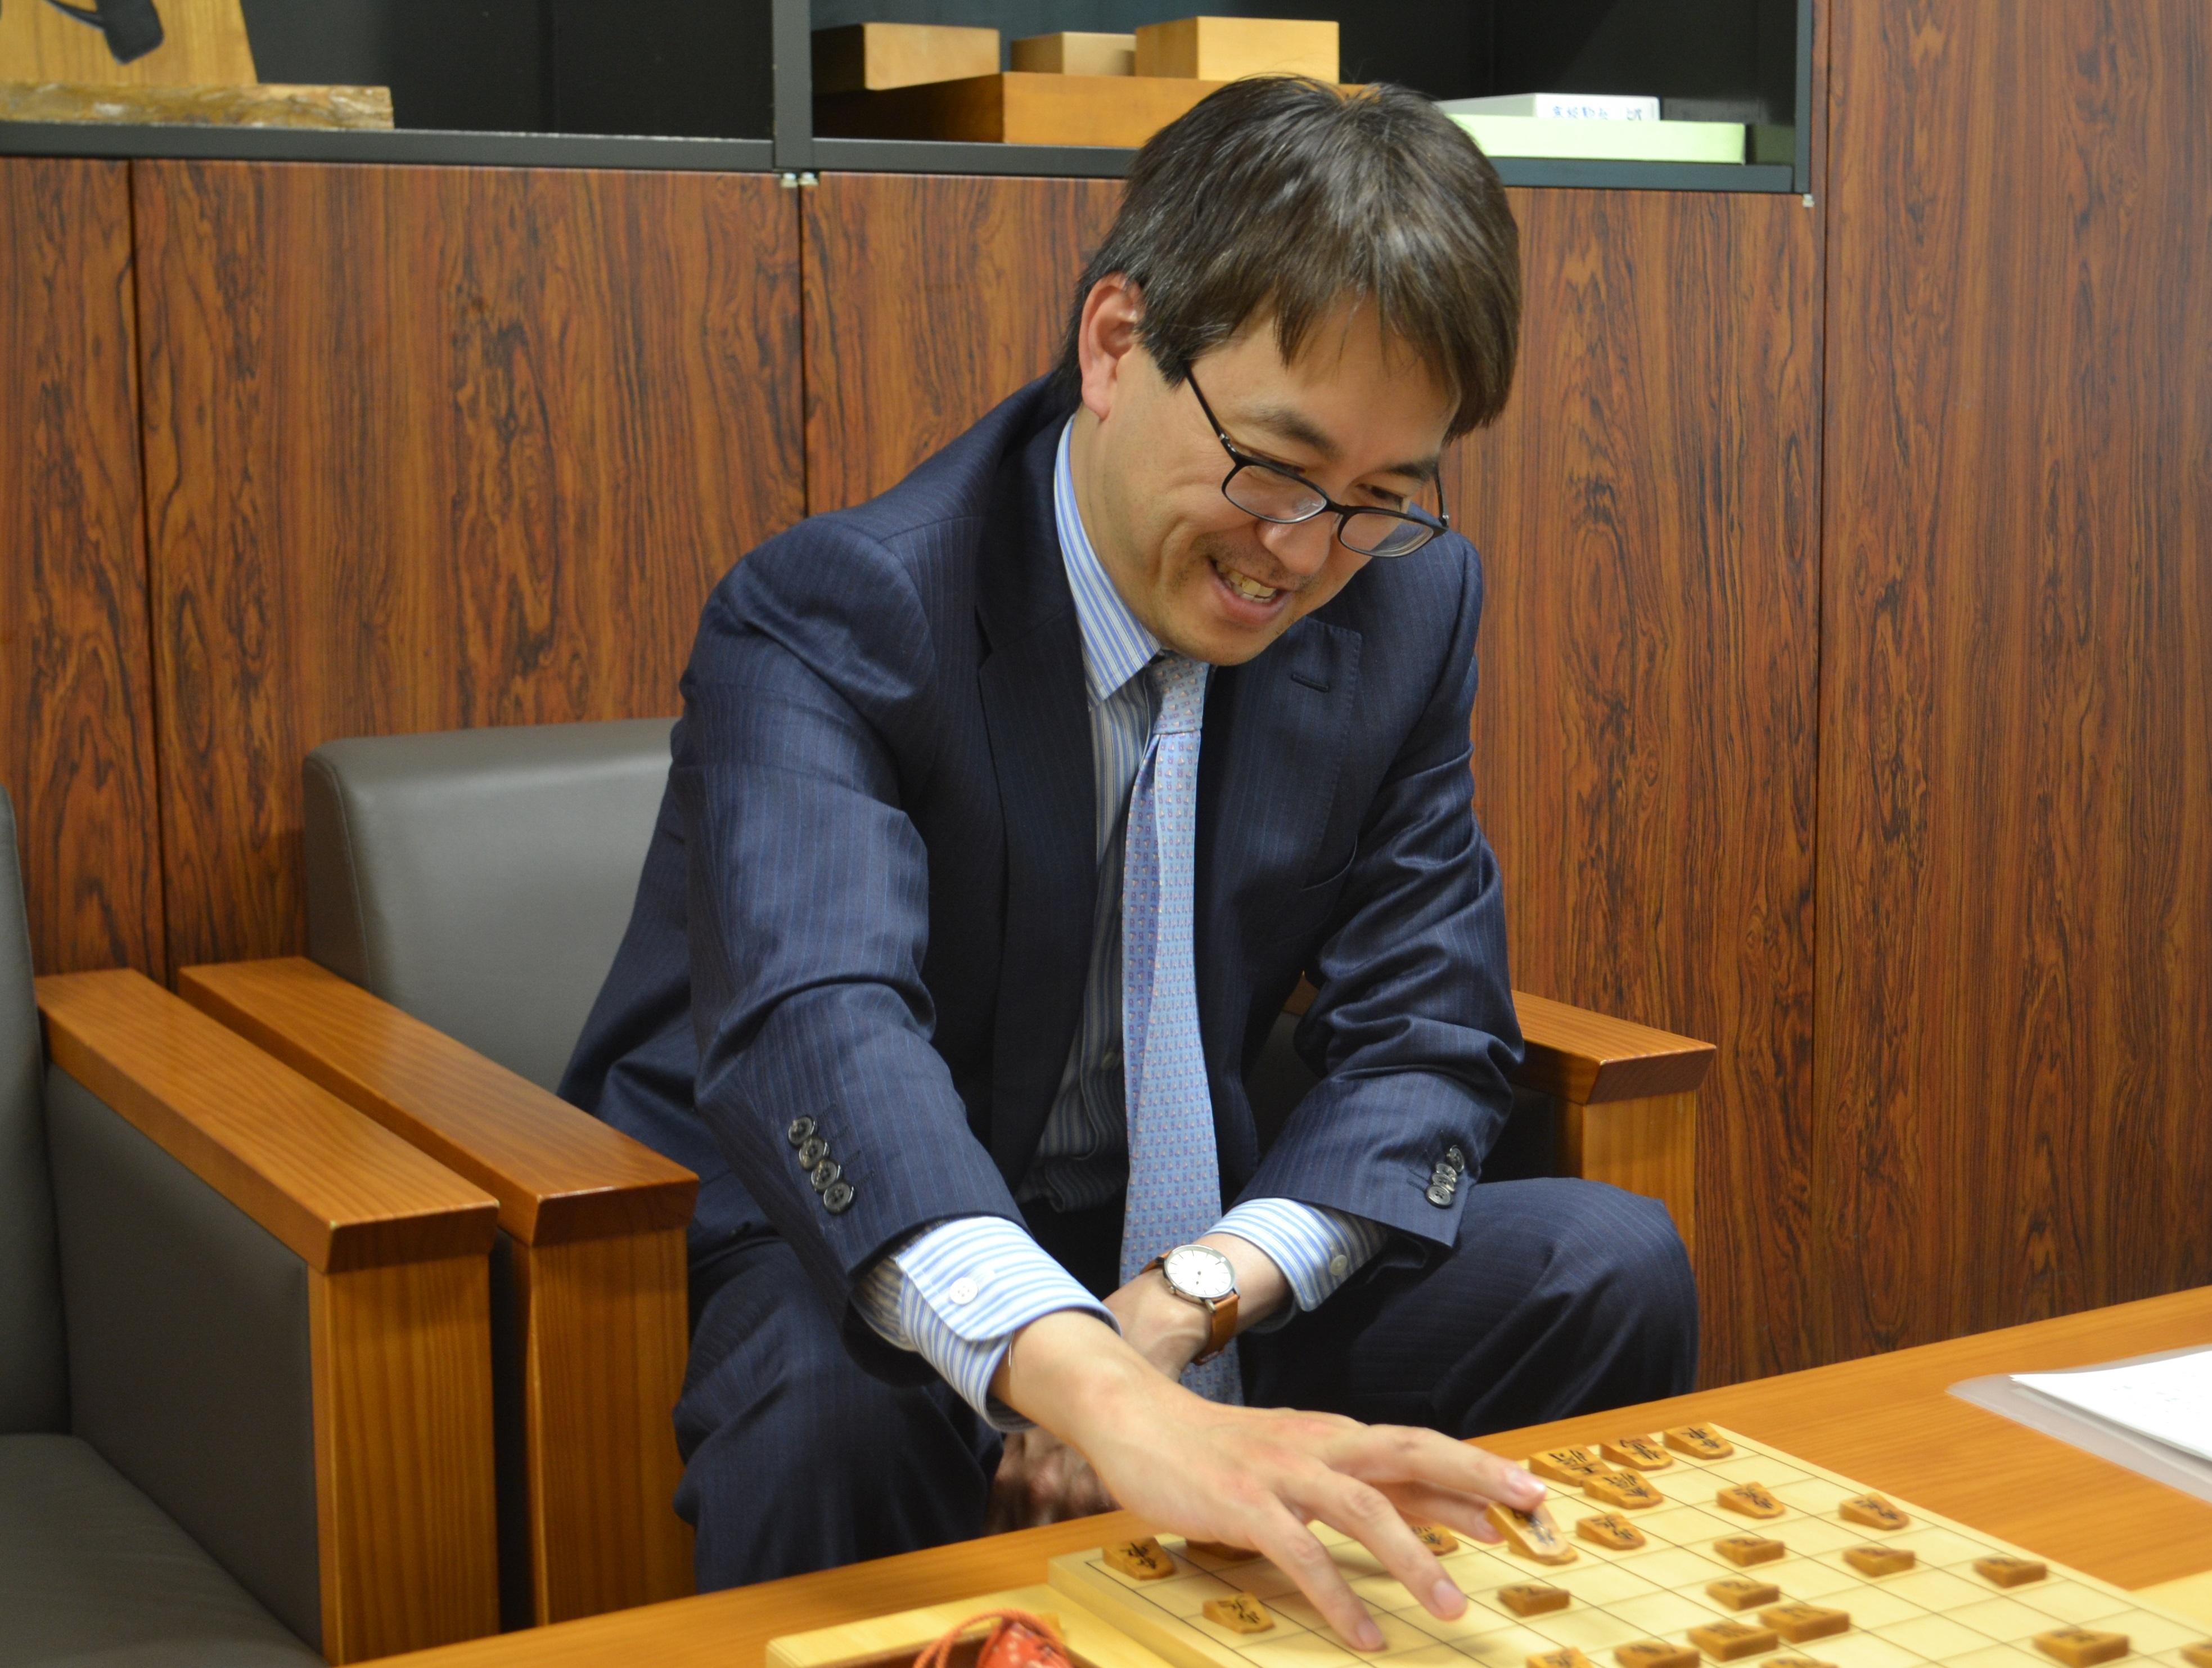 Images of 江戸時代の将棋棋士一覧 - JapaneseClass.jp